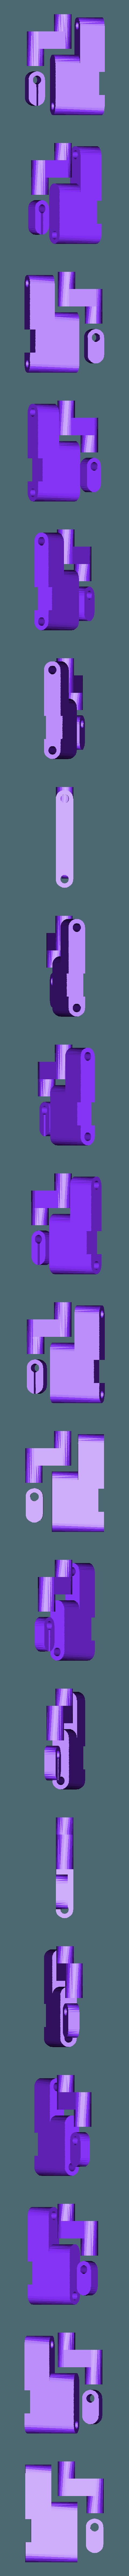 Raspberry_Pi_to_Arduino_Mount_V1.stl Download free STL file Arduino to Raspberry Pi Mount V1.0 • 3D printable design, Obenottr3D